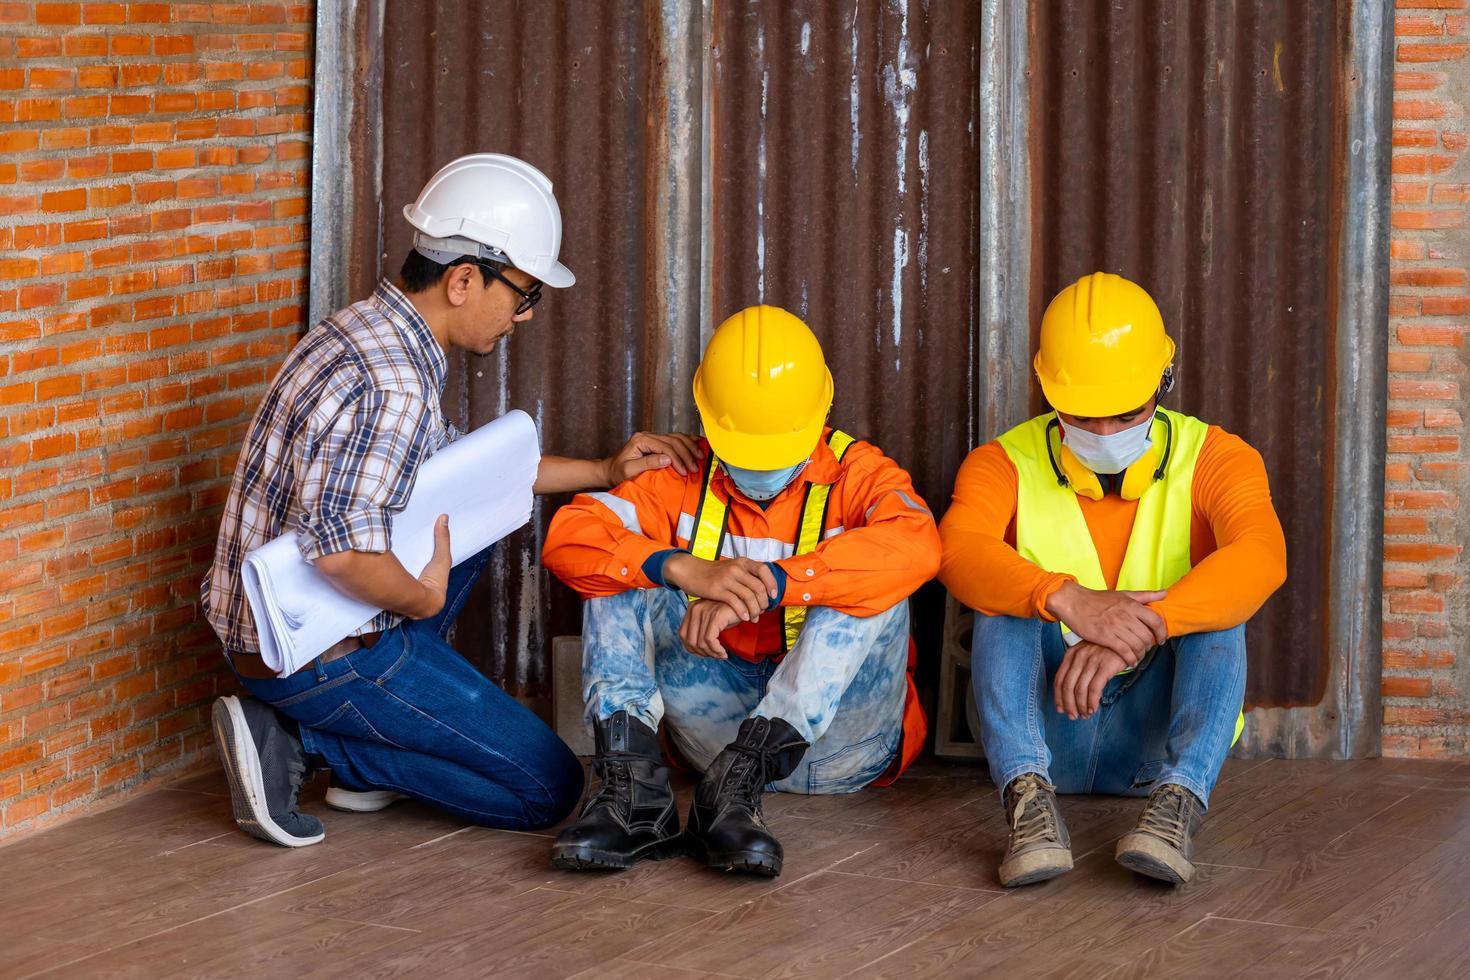 Three men wearing protective equipment next to brick wall photo